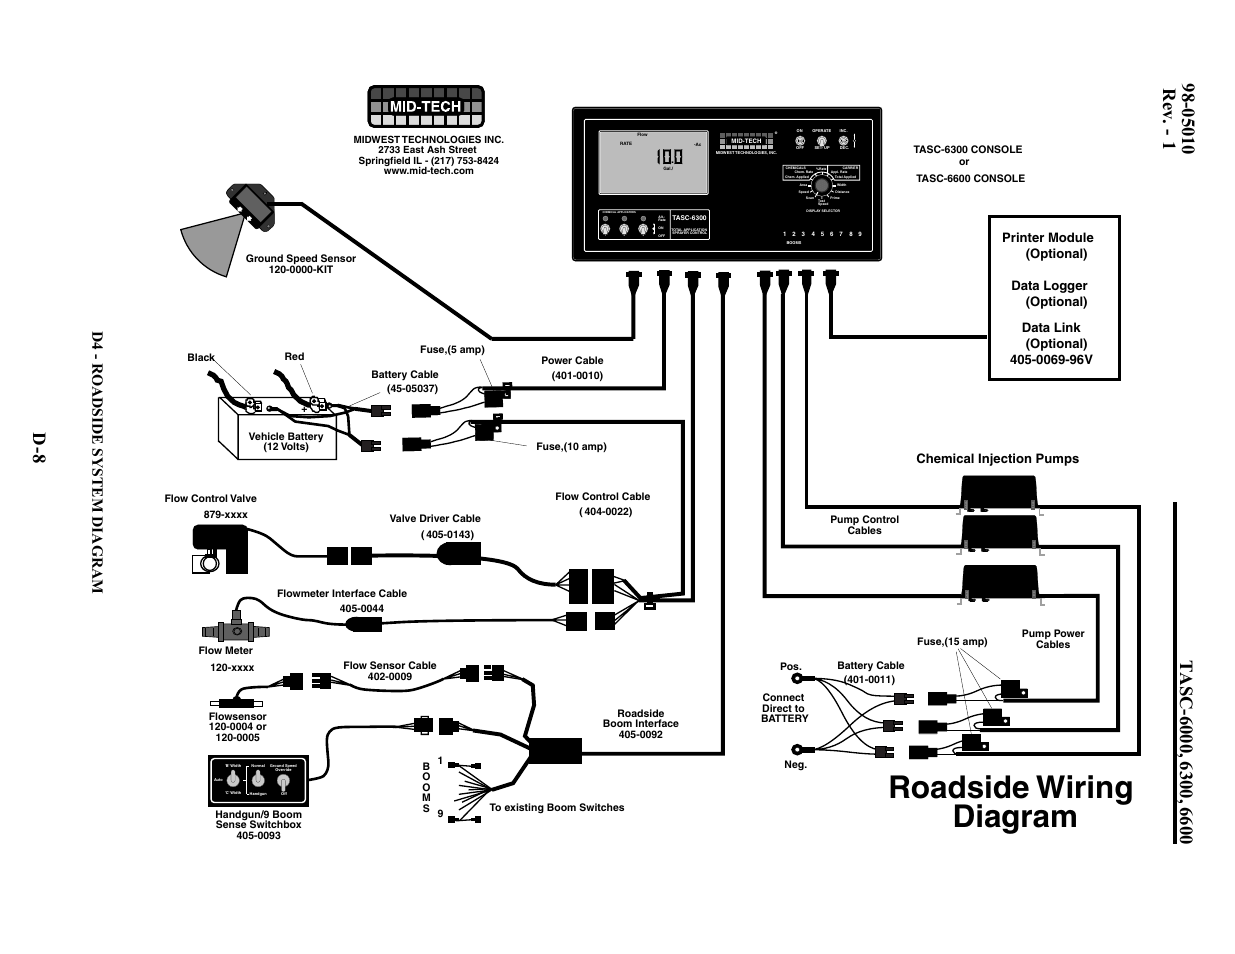 Roadside Wiring Diagram D4